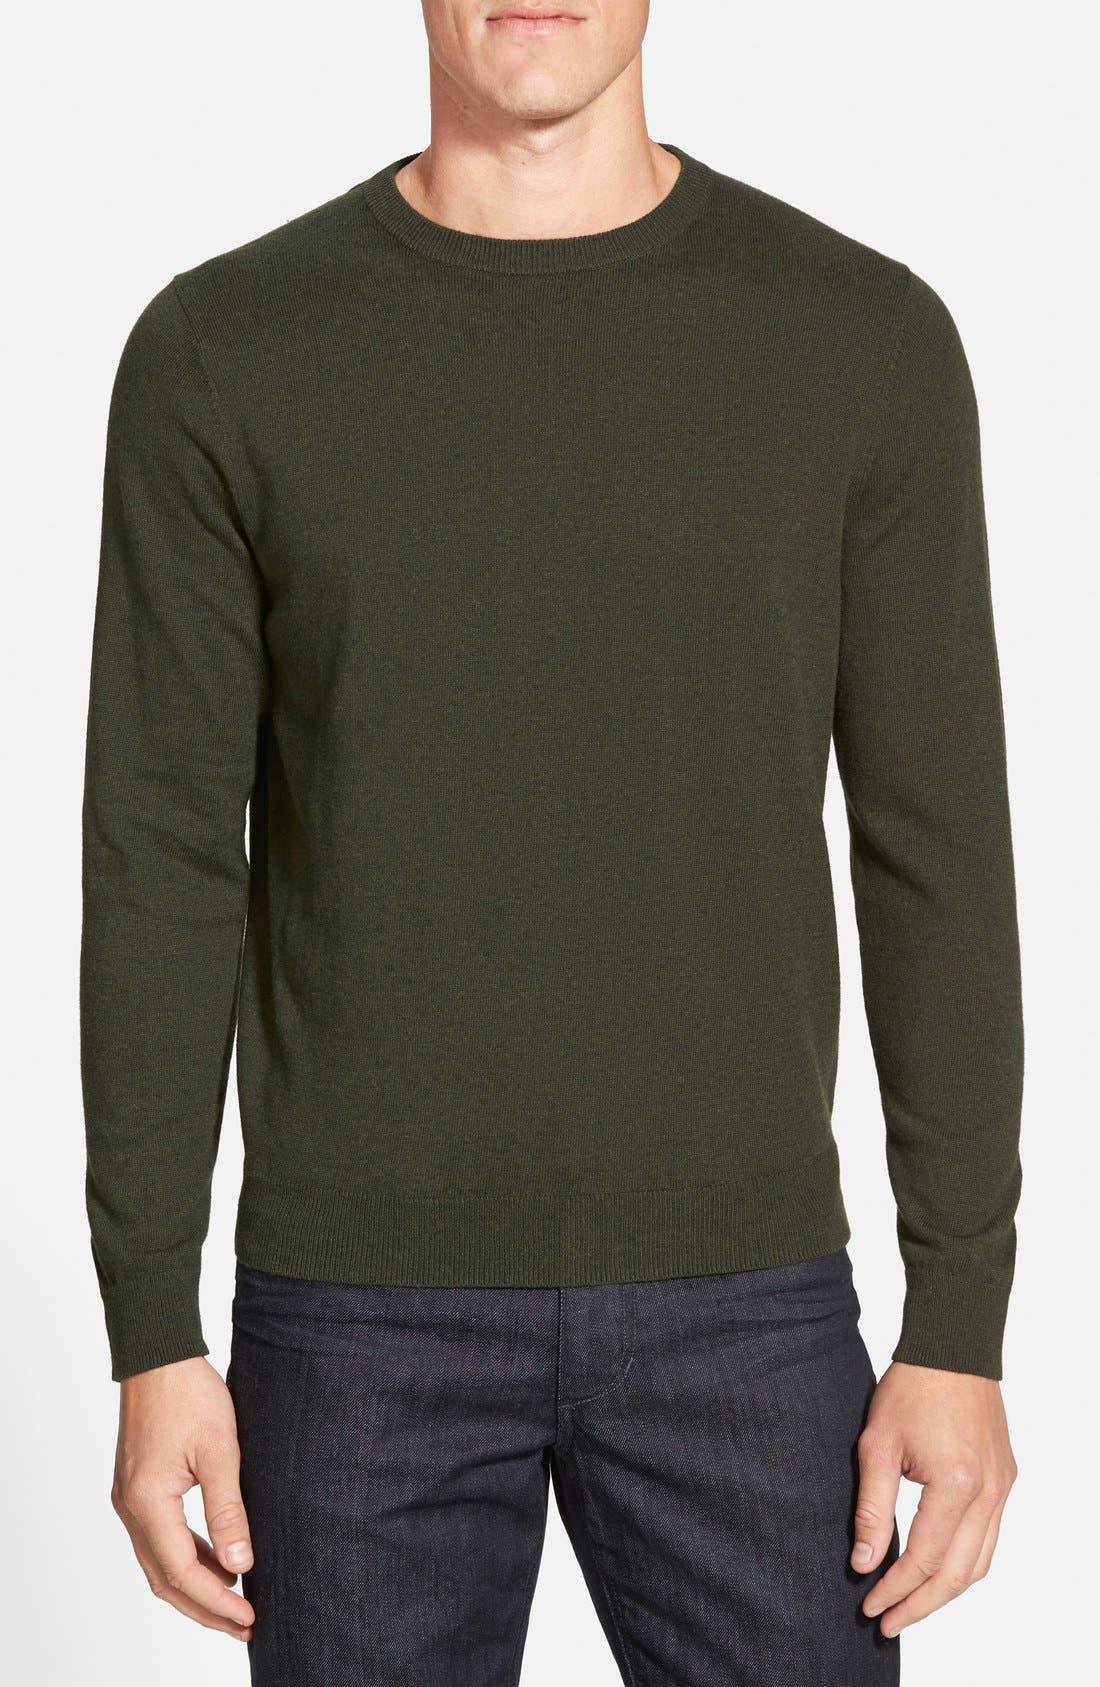 Nordstrom Men's Shop Cotton & Cashmere Crewneck Sweater (Regular & Tall)